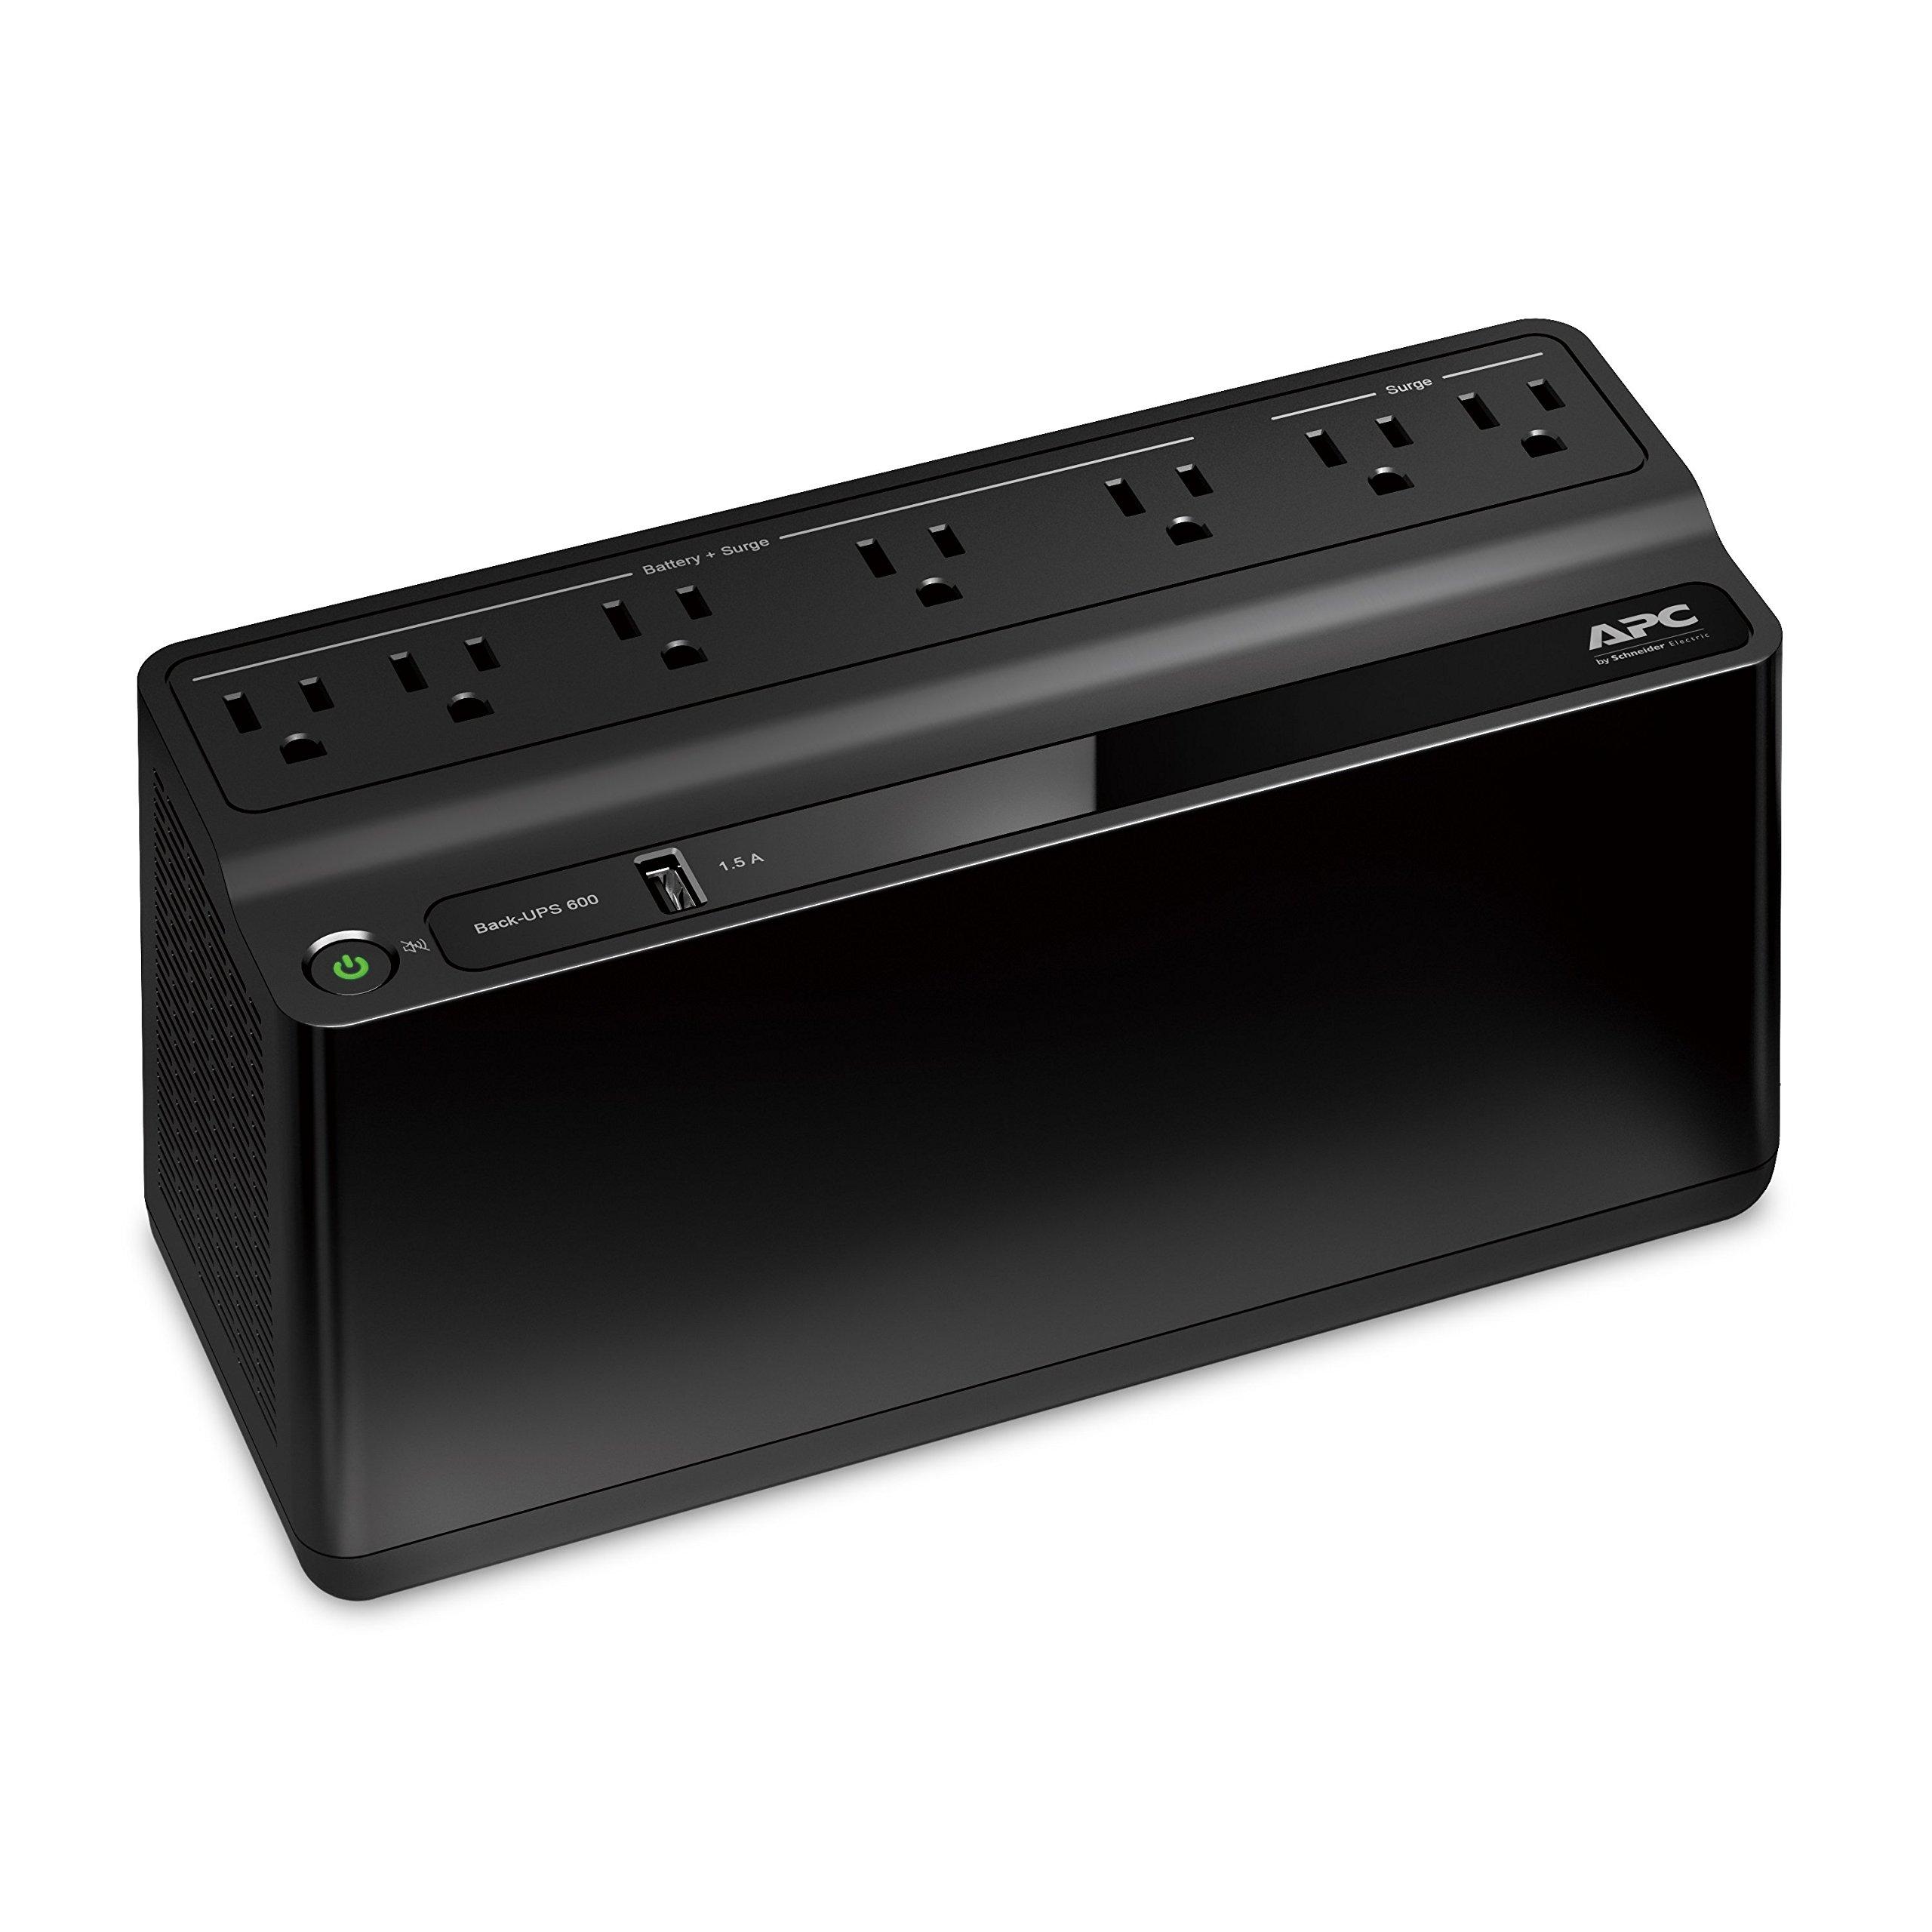 APC UPS Battery Backup & Surge Protector with USB Charger, 600VA, APC Back-UPS (BE600M1) by APC